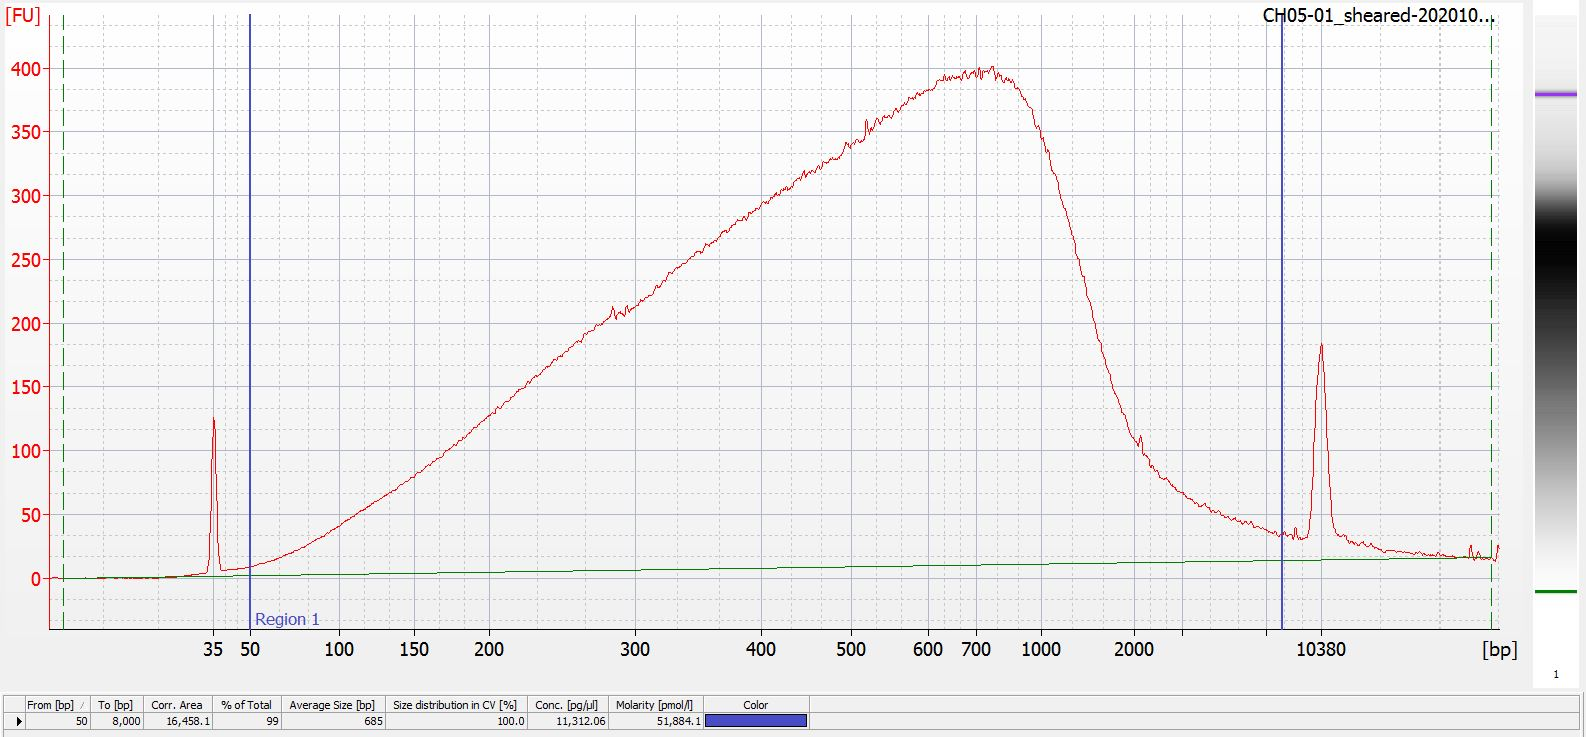 Sheared CH05-01 Bioanalyzer electropherogram